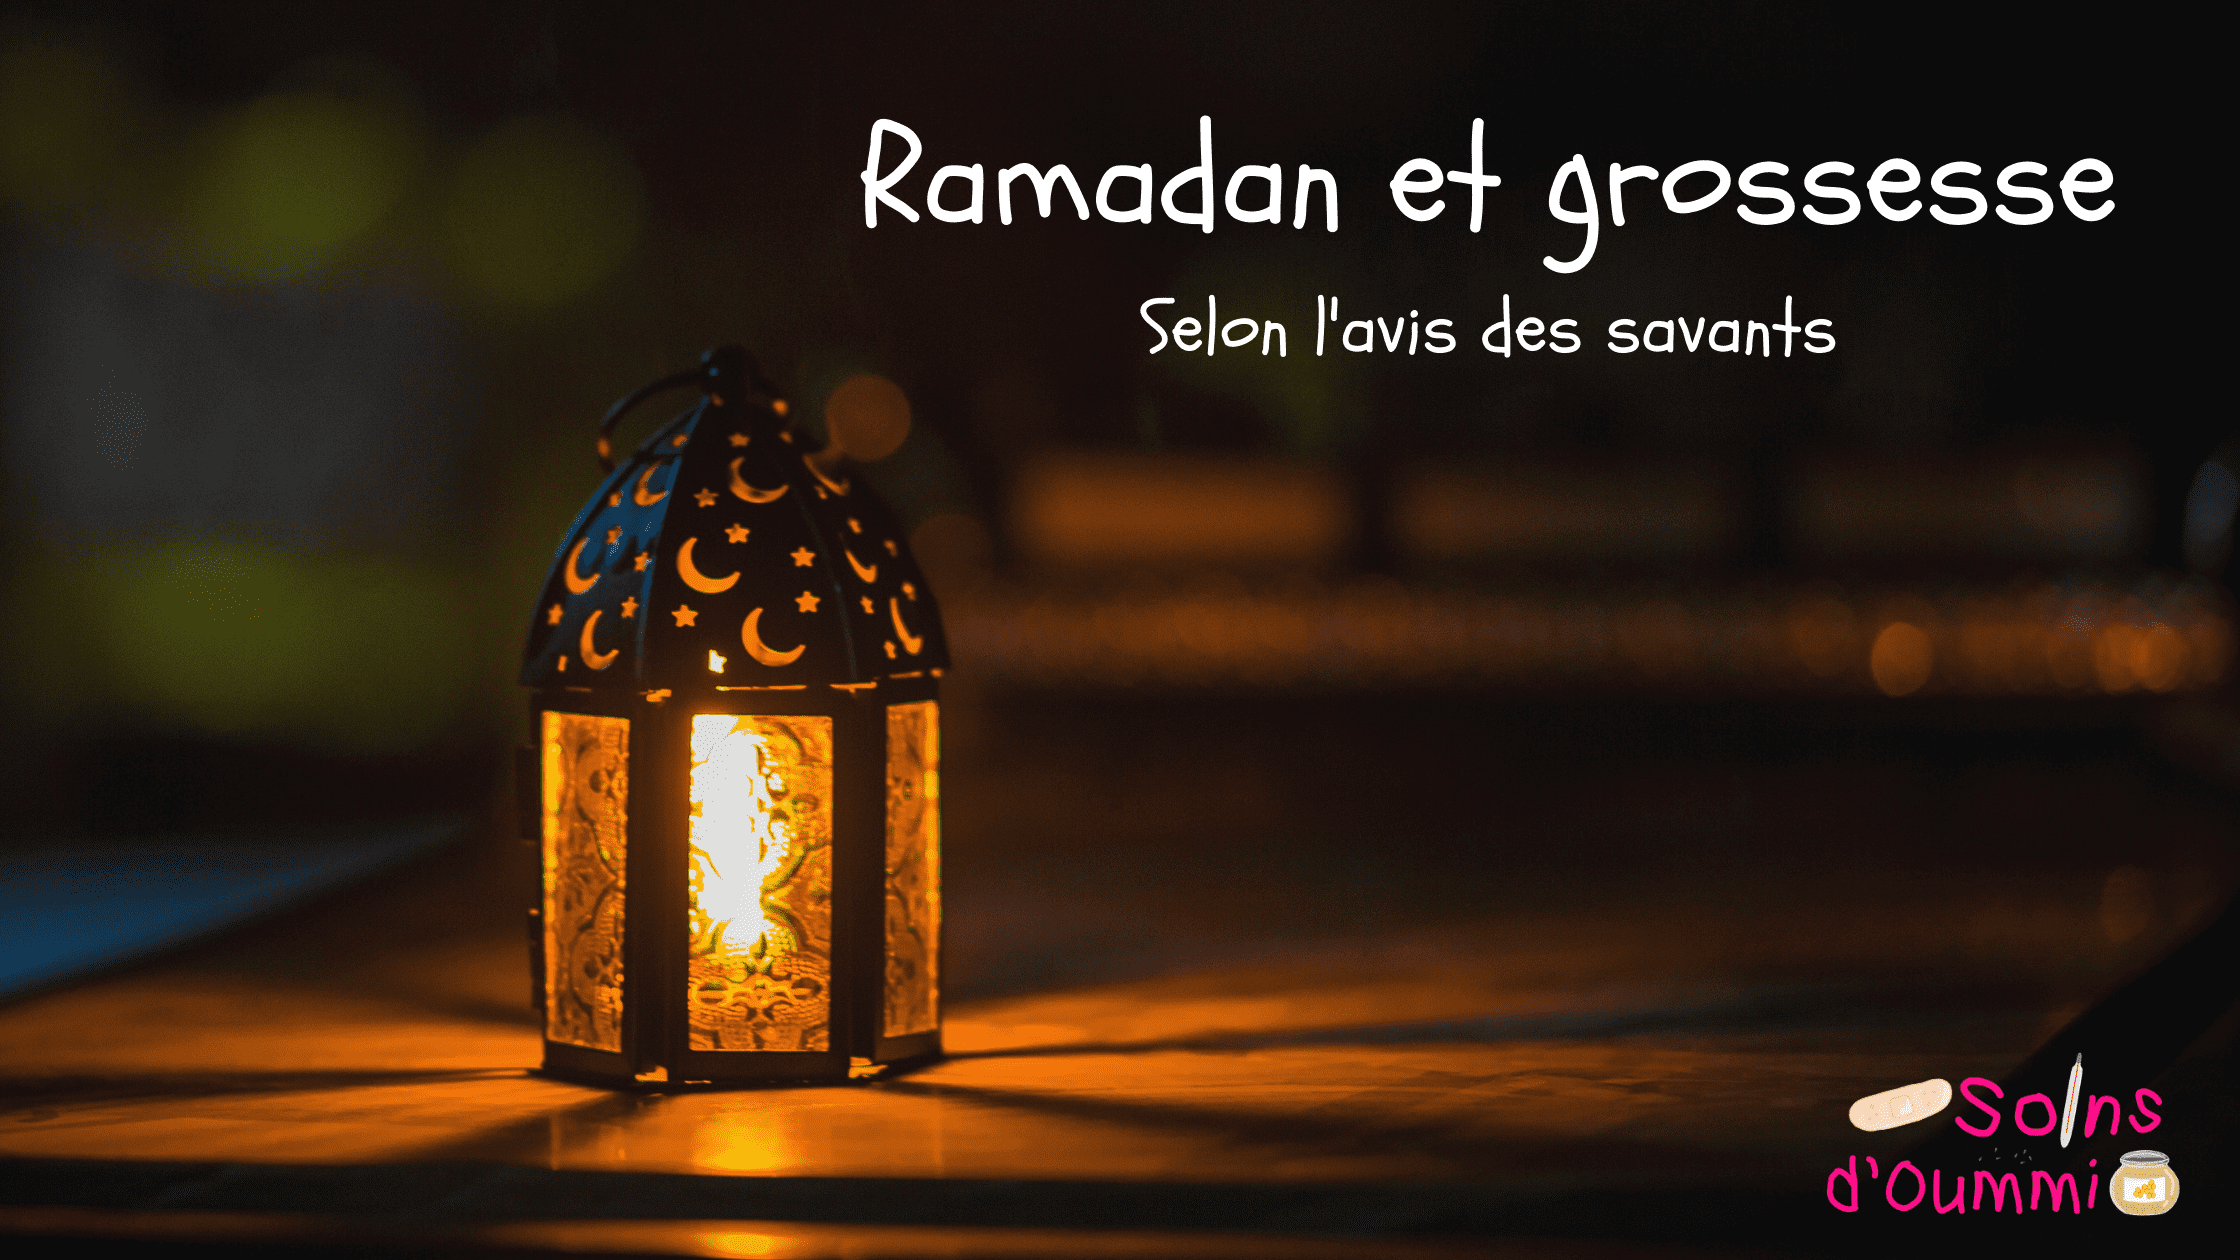 Ramadan et grossesse